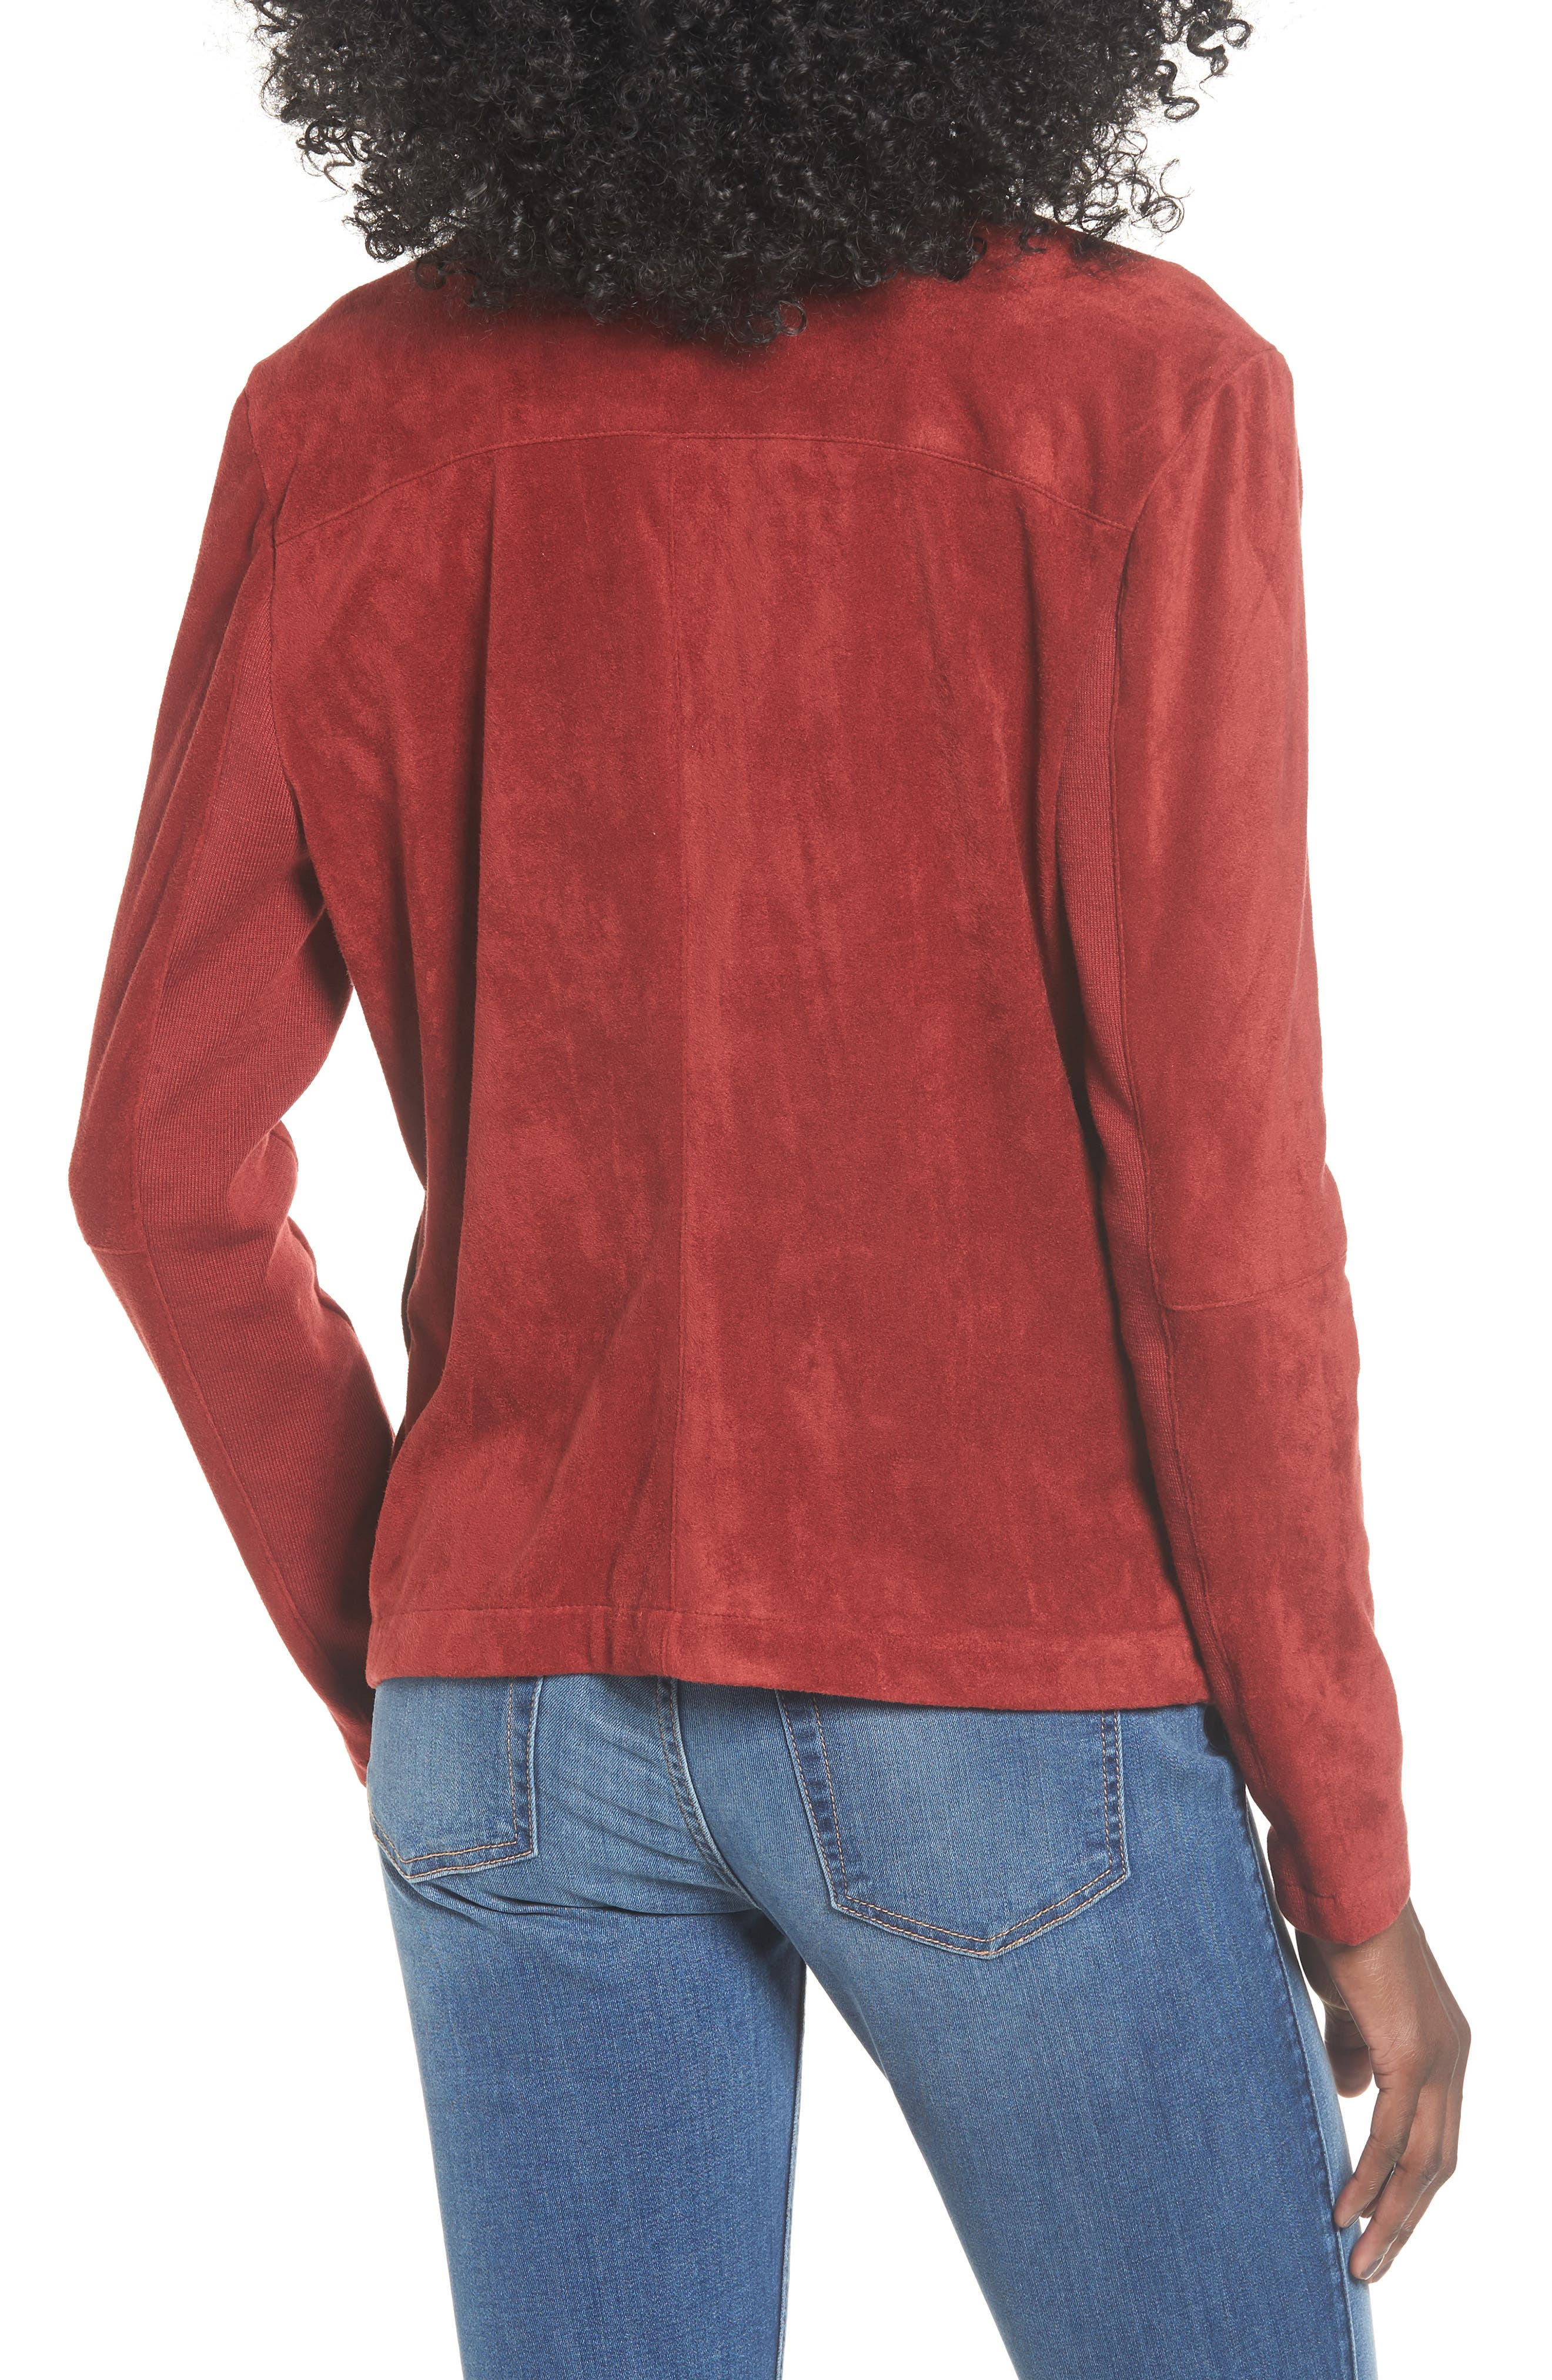 BB DAKOTA,                             Nicholson Faux Suede Drape Front Jacket,                             Alternate thumbnail 2, color,                             BRICK RED